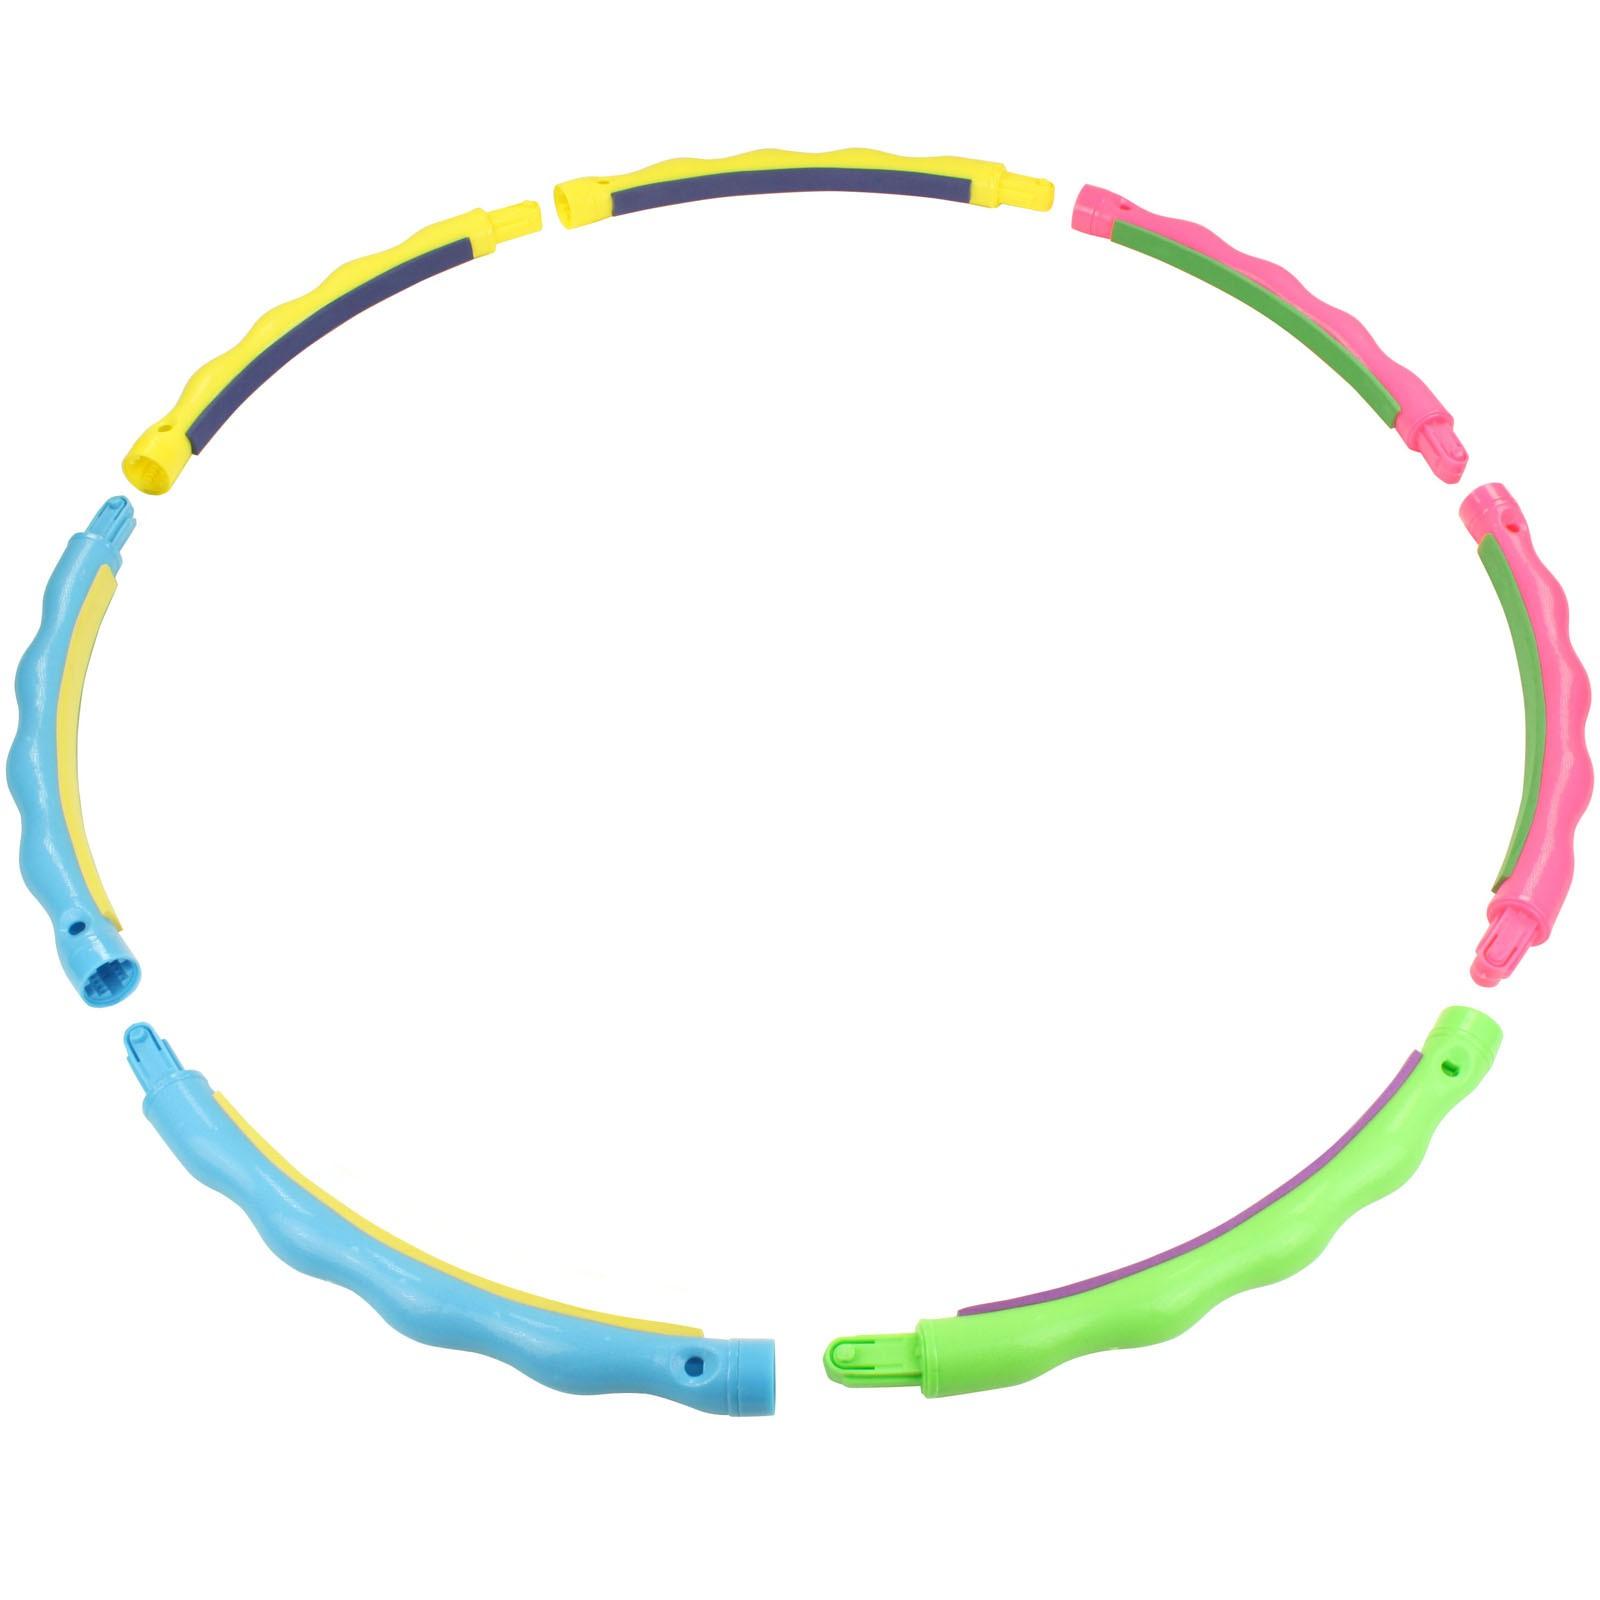 hula hoop reifen xxl abnehmen fitness gymnastik hoopdance hooping turnreifen ebay. Black Bedroom Furniture Sets. Home Design Ideas